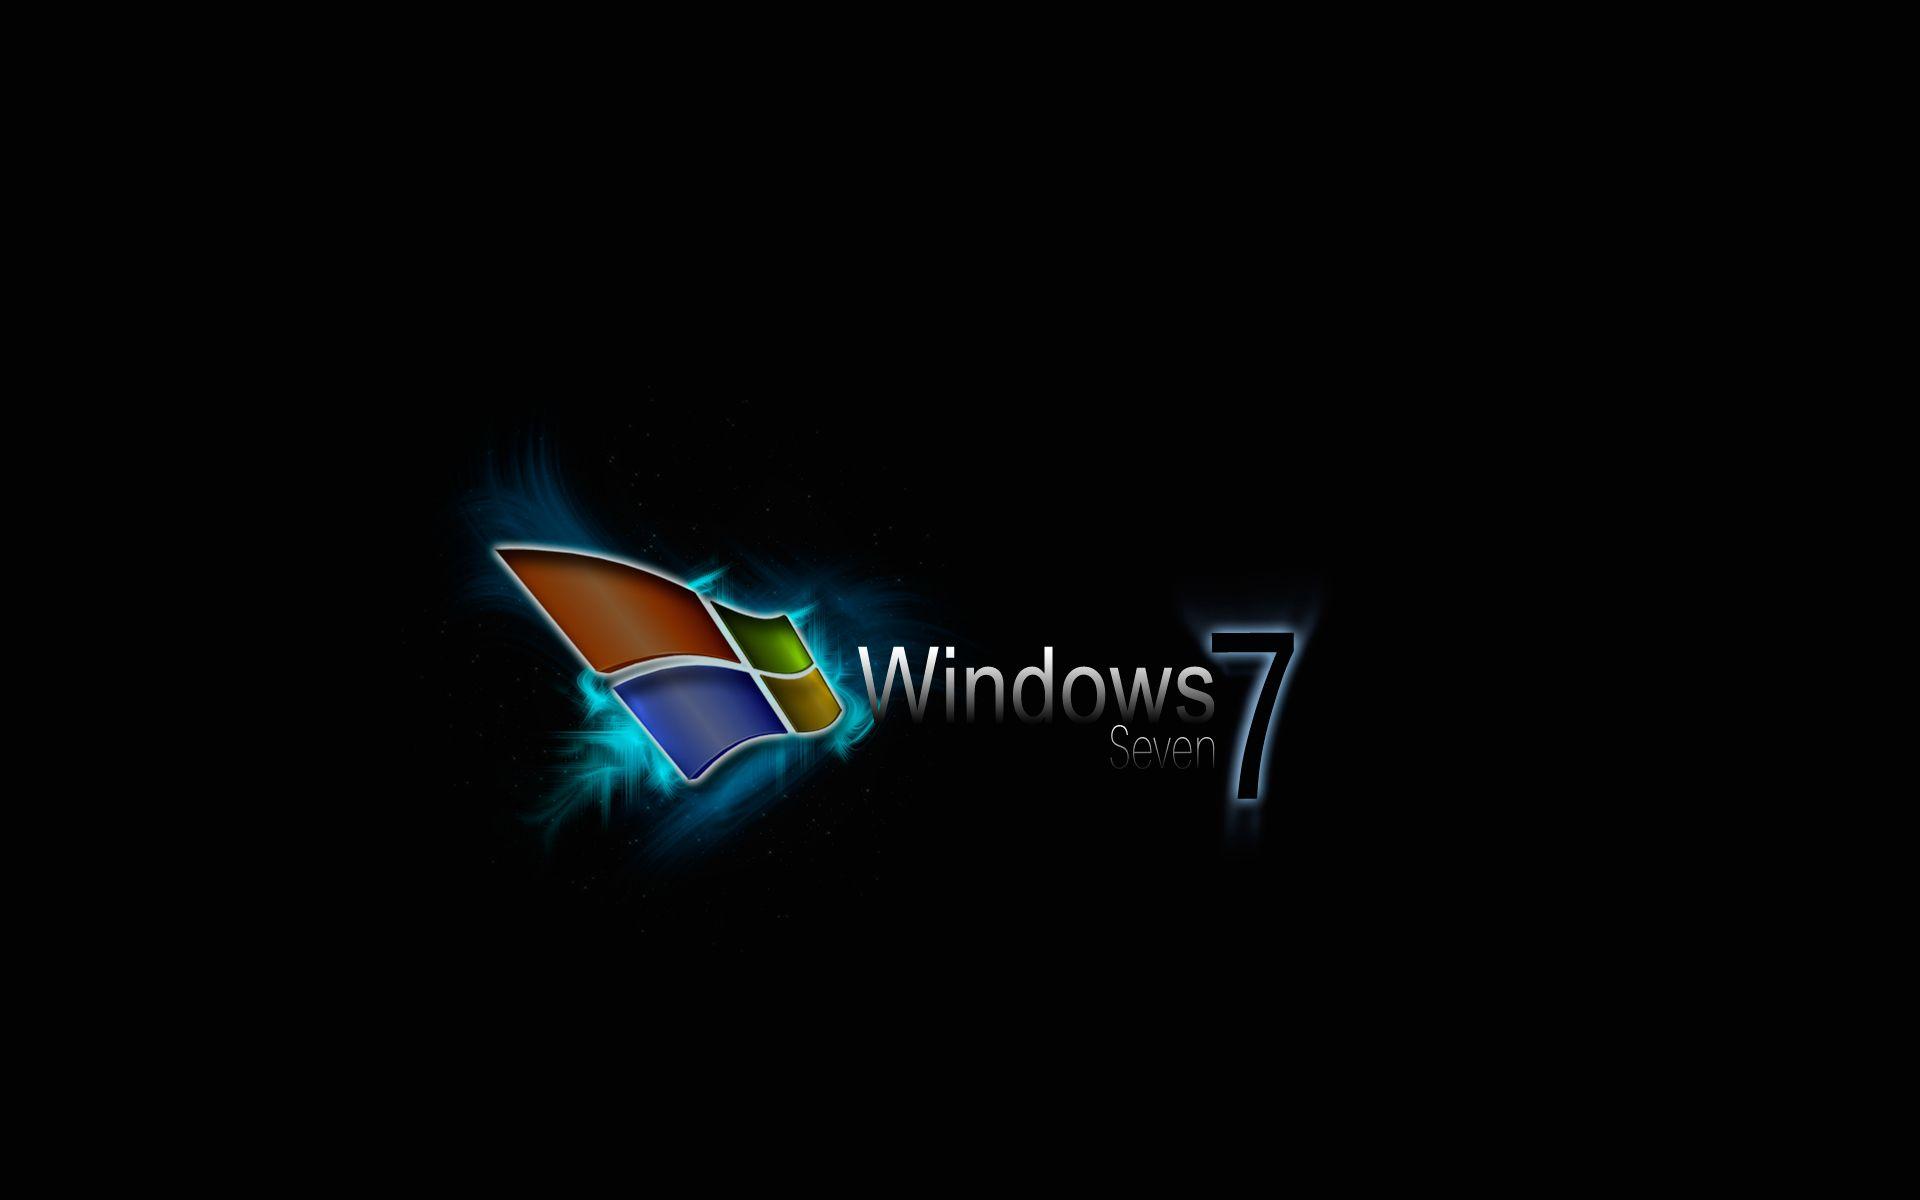 Never Had A Problem With Windows Vista But I M Loving Windows 7 Wallpaper Windows 10 Desktop Wallpaper Black Windows Wallpaper